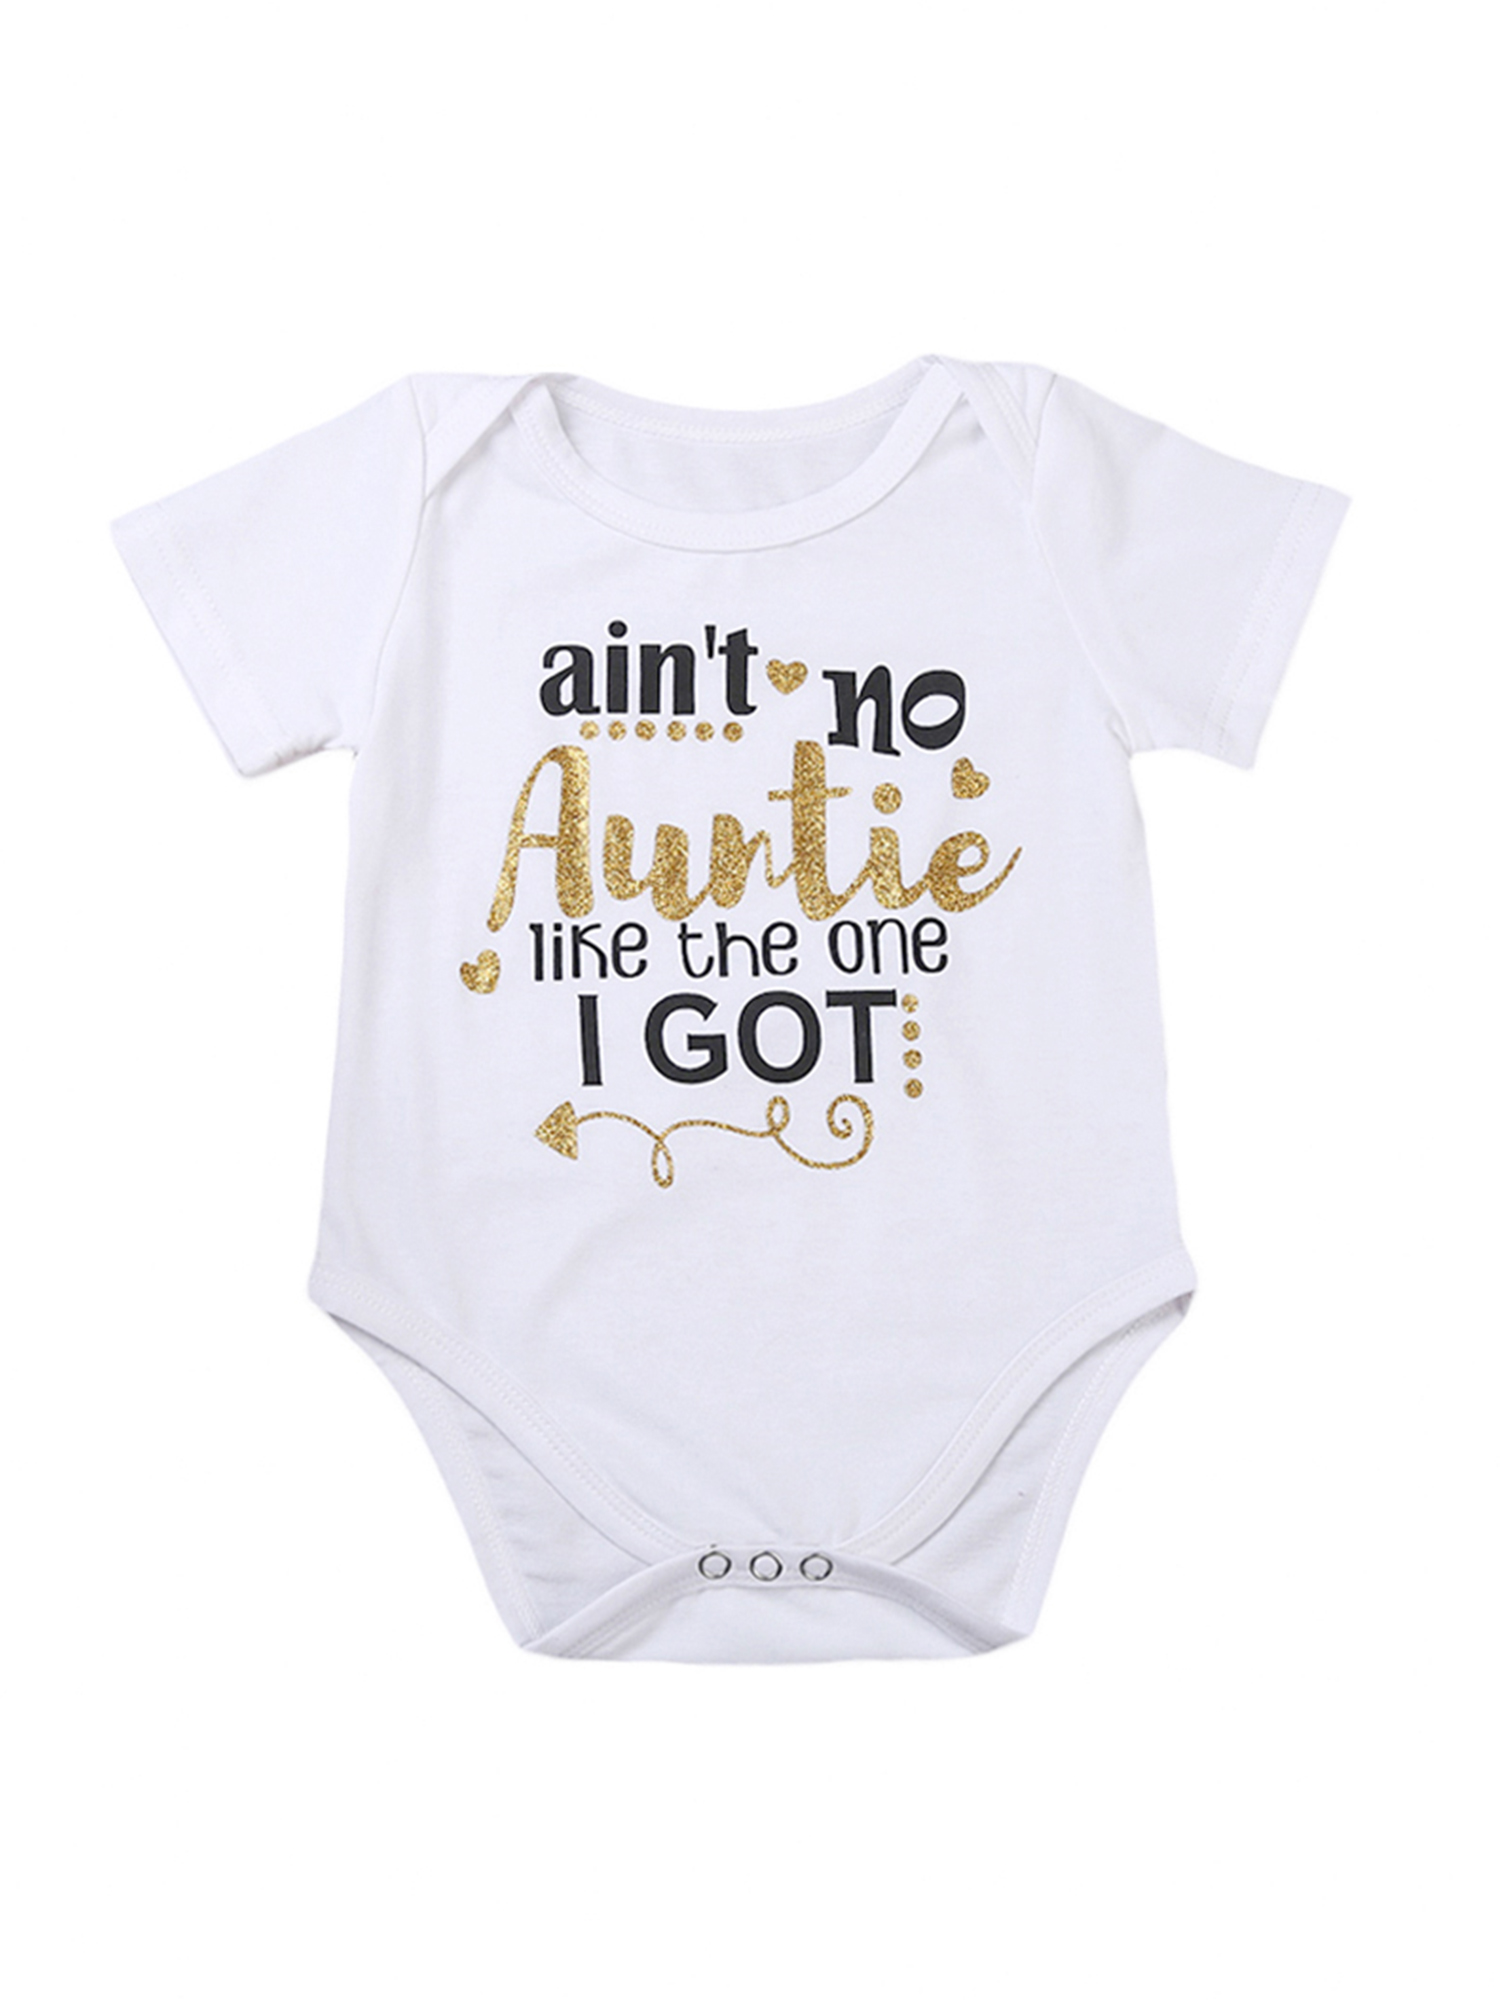 Baby Stylish Letter Bodysuit In White